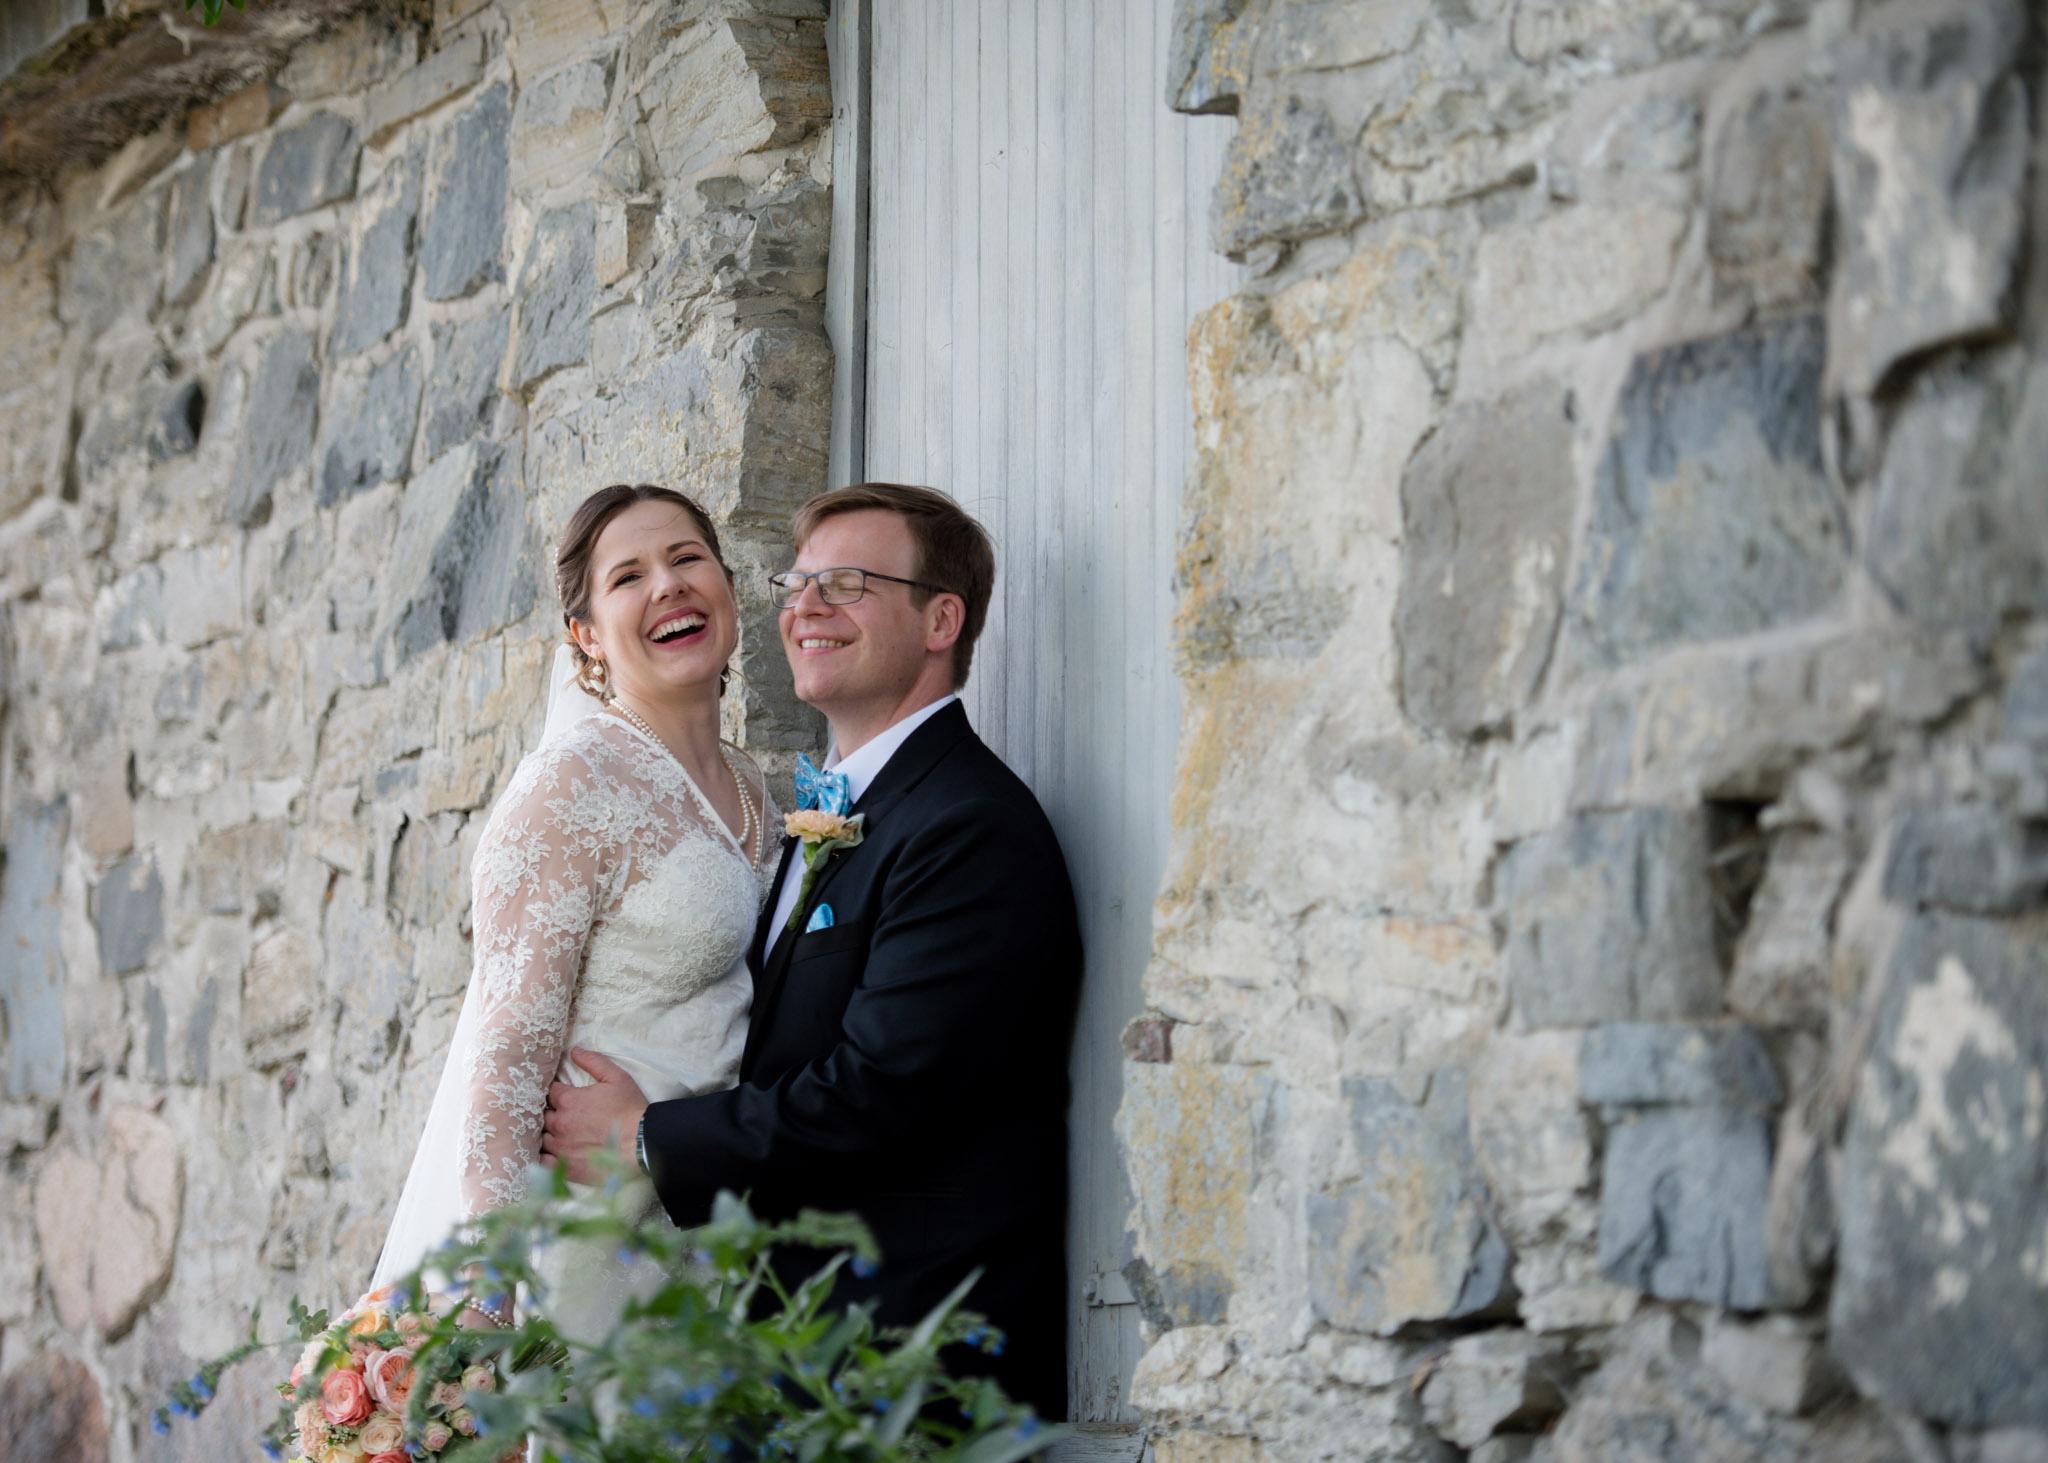 bryllupsfotograf-tønsberg-nøtterøy-fotograf-tjøme-vestfold-oslo-fotografvarpe--6005.JPG